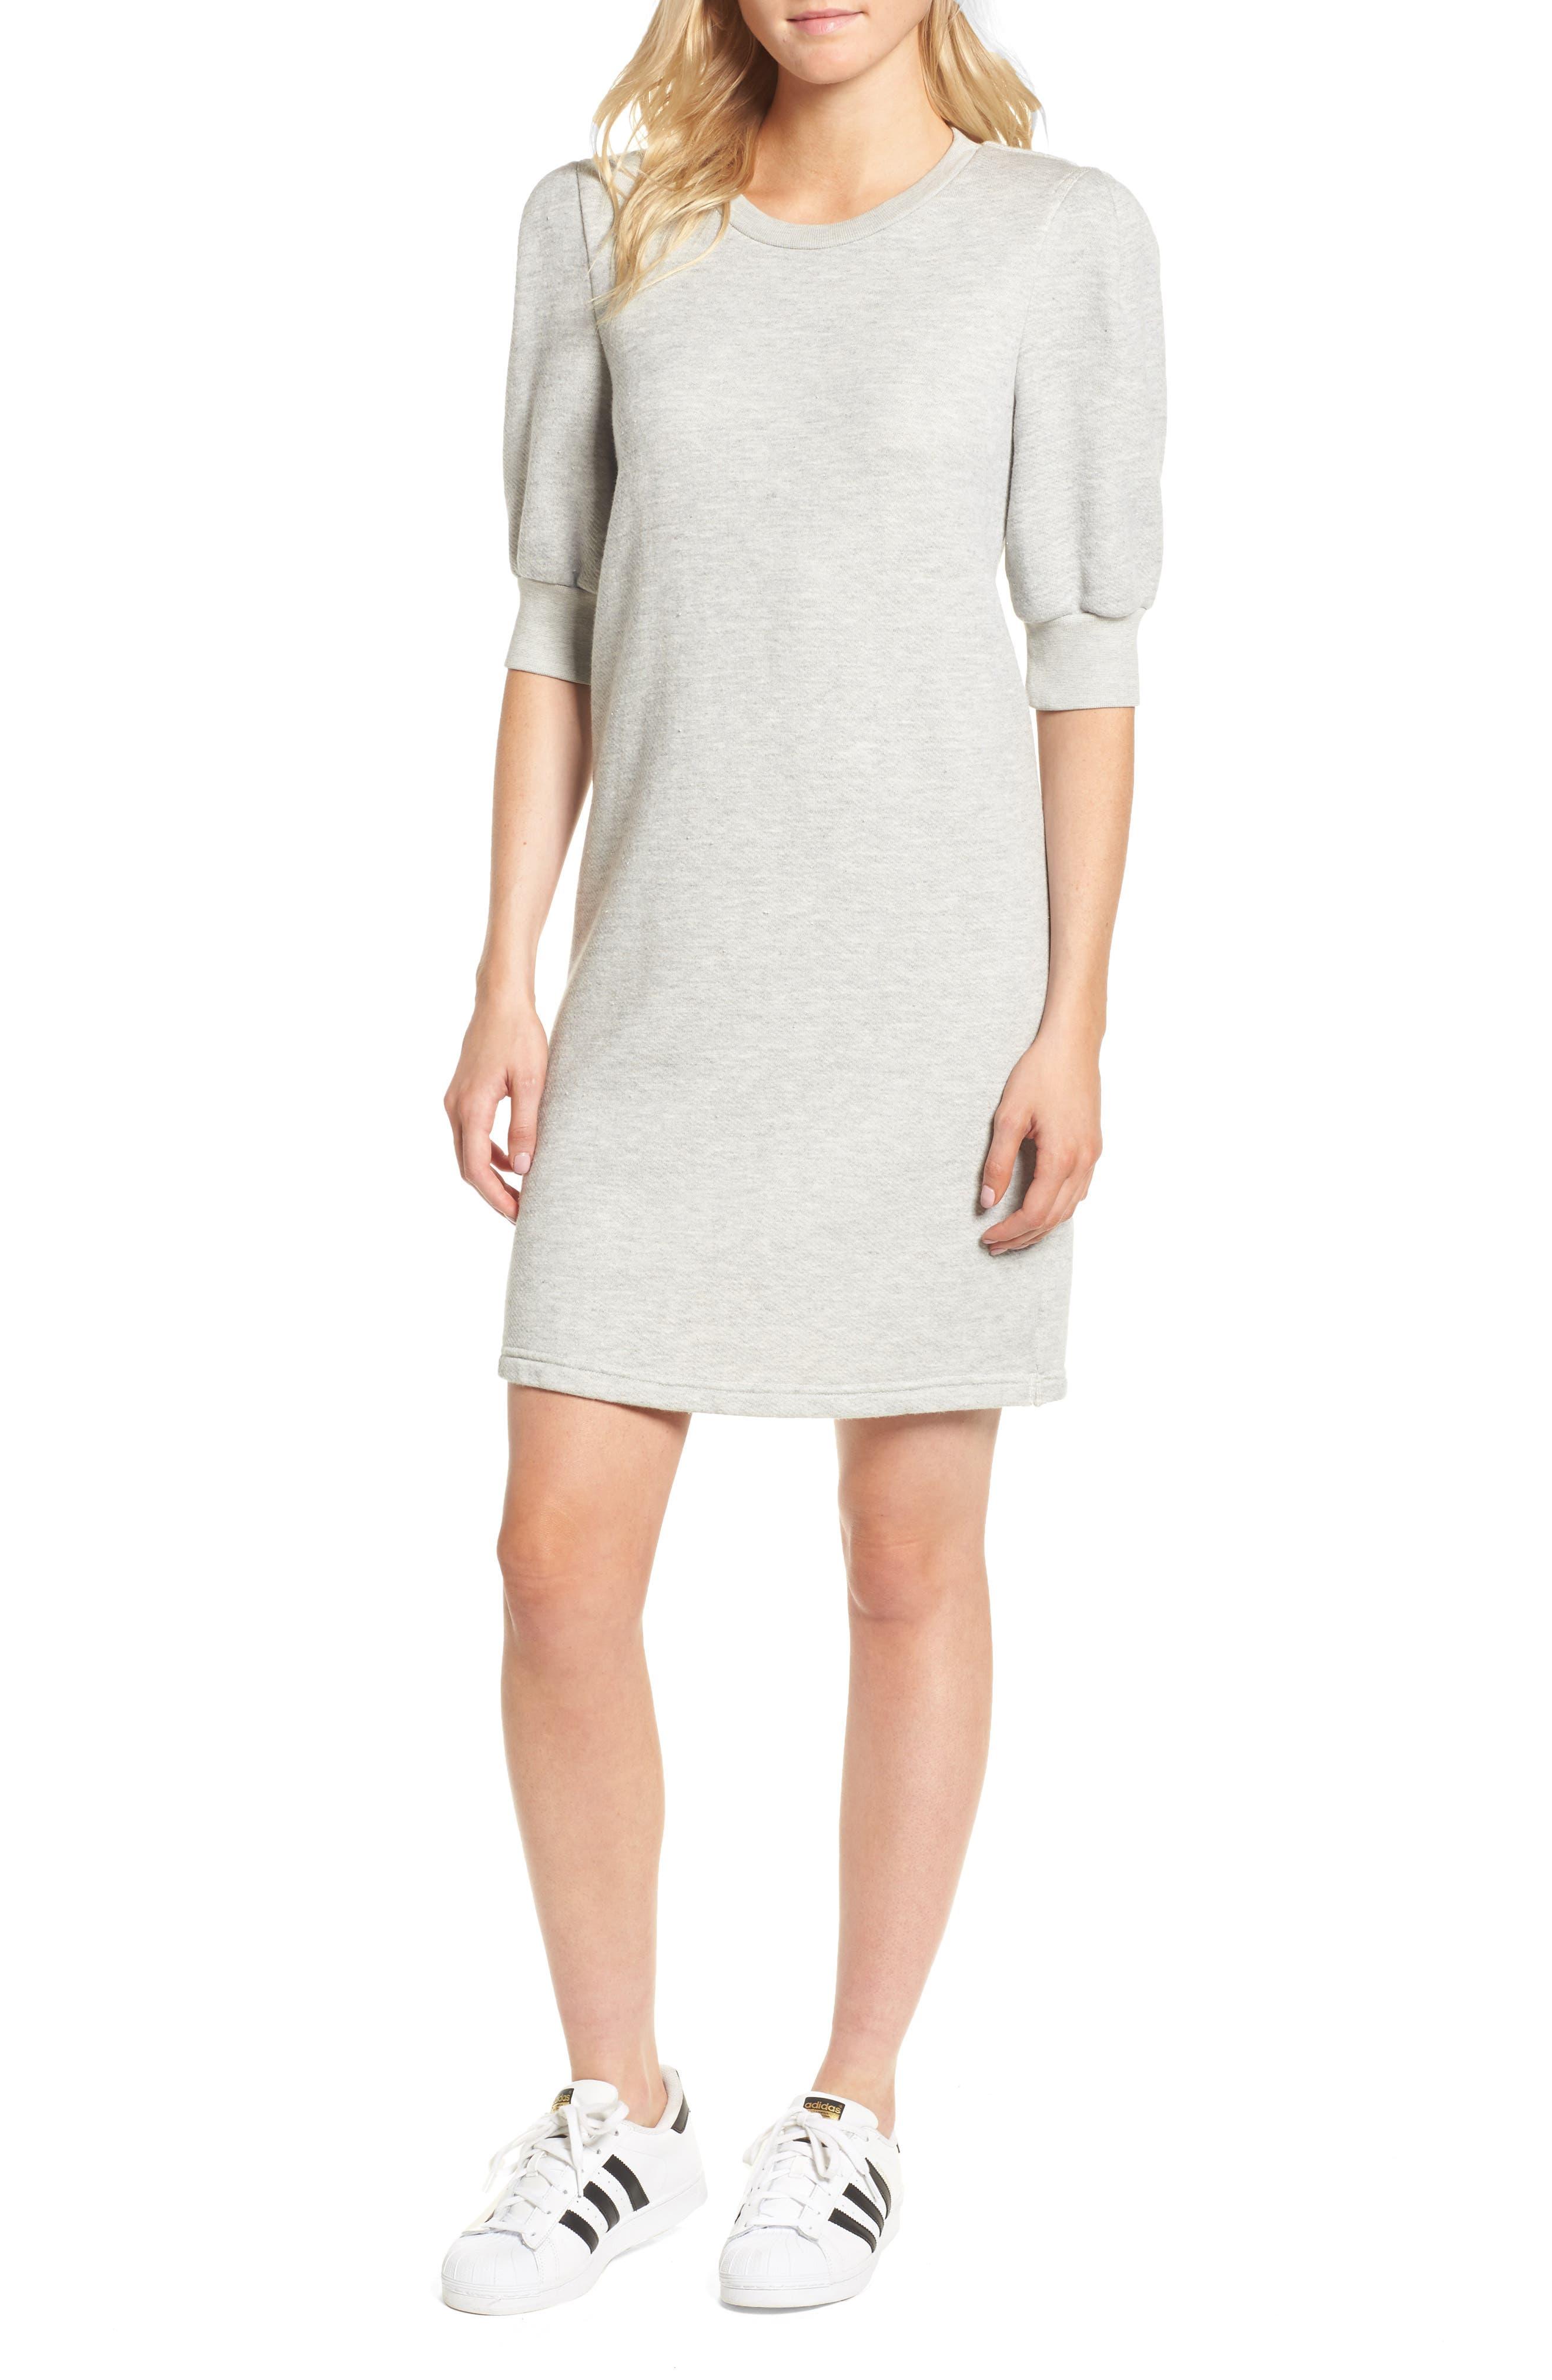 The Pleat Sweatshirt Dress,                         Main,                         color, Light Heather Grey Terry